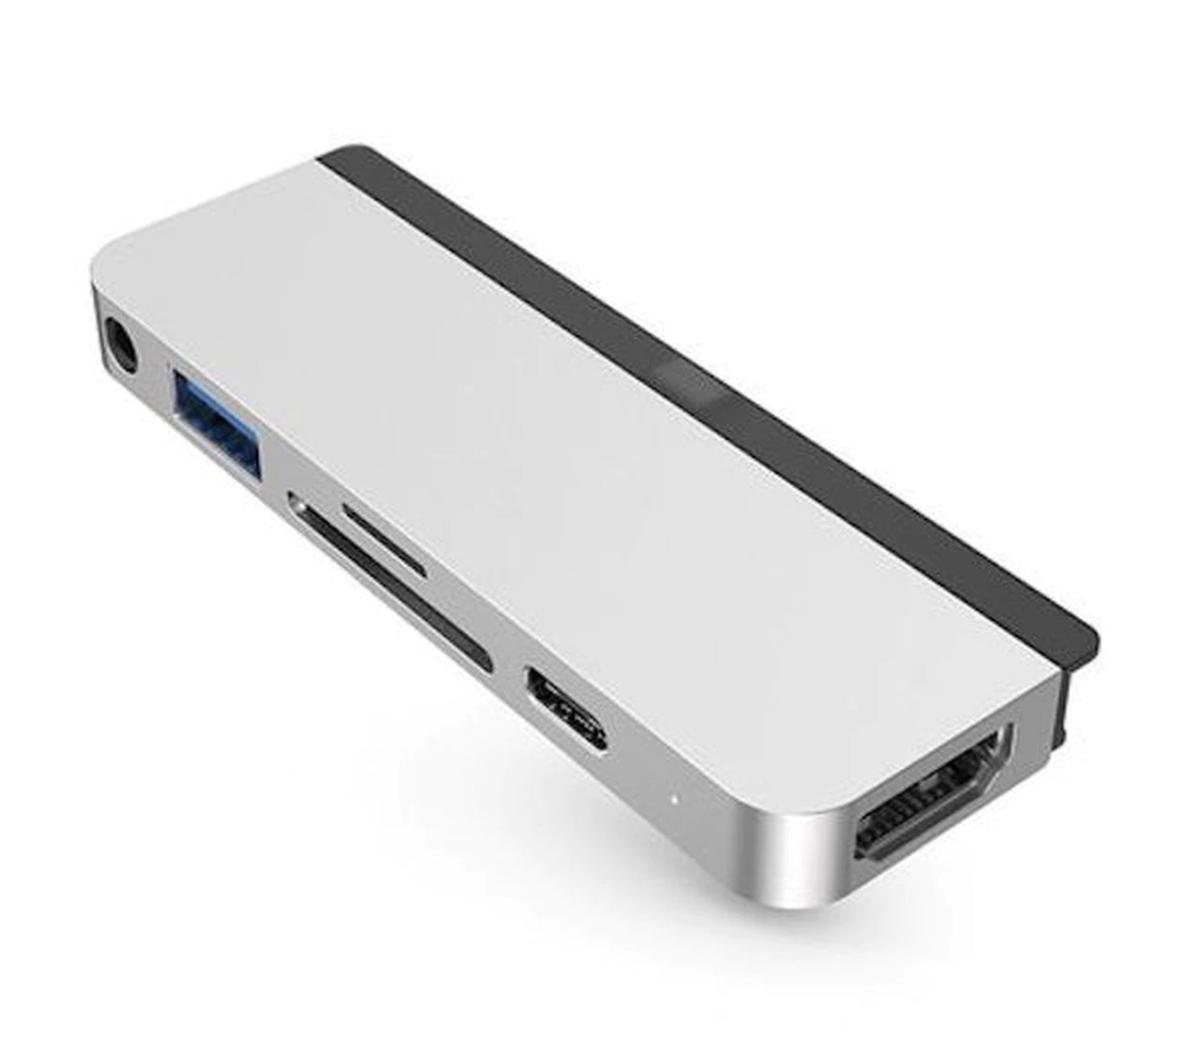 HyperDrive USB-C 3.1 6-in-1 Hub for iPad Pro